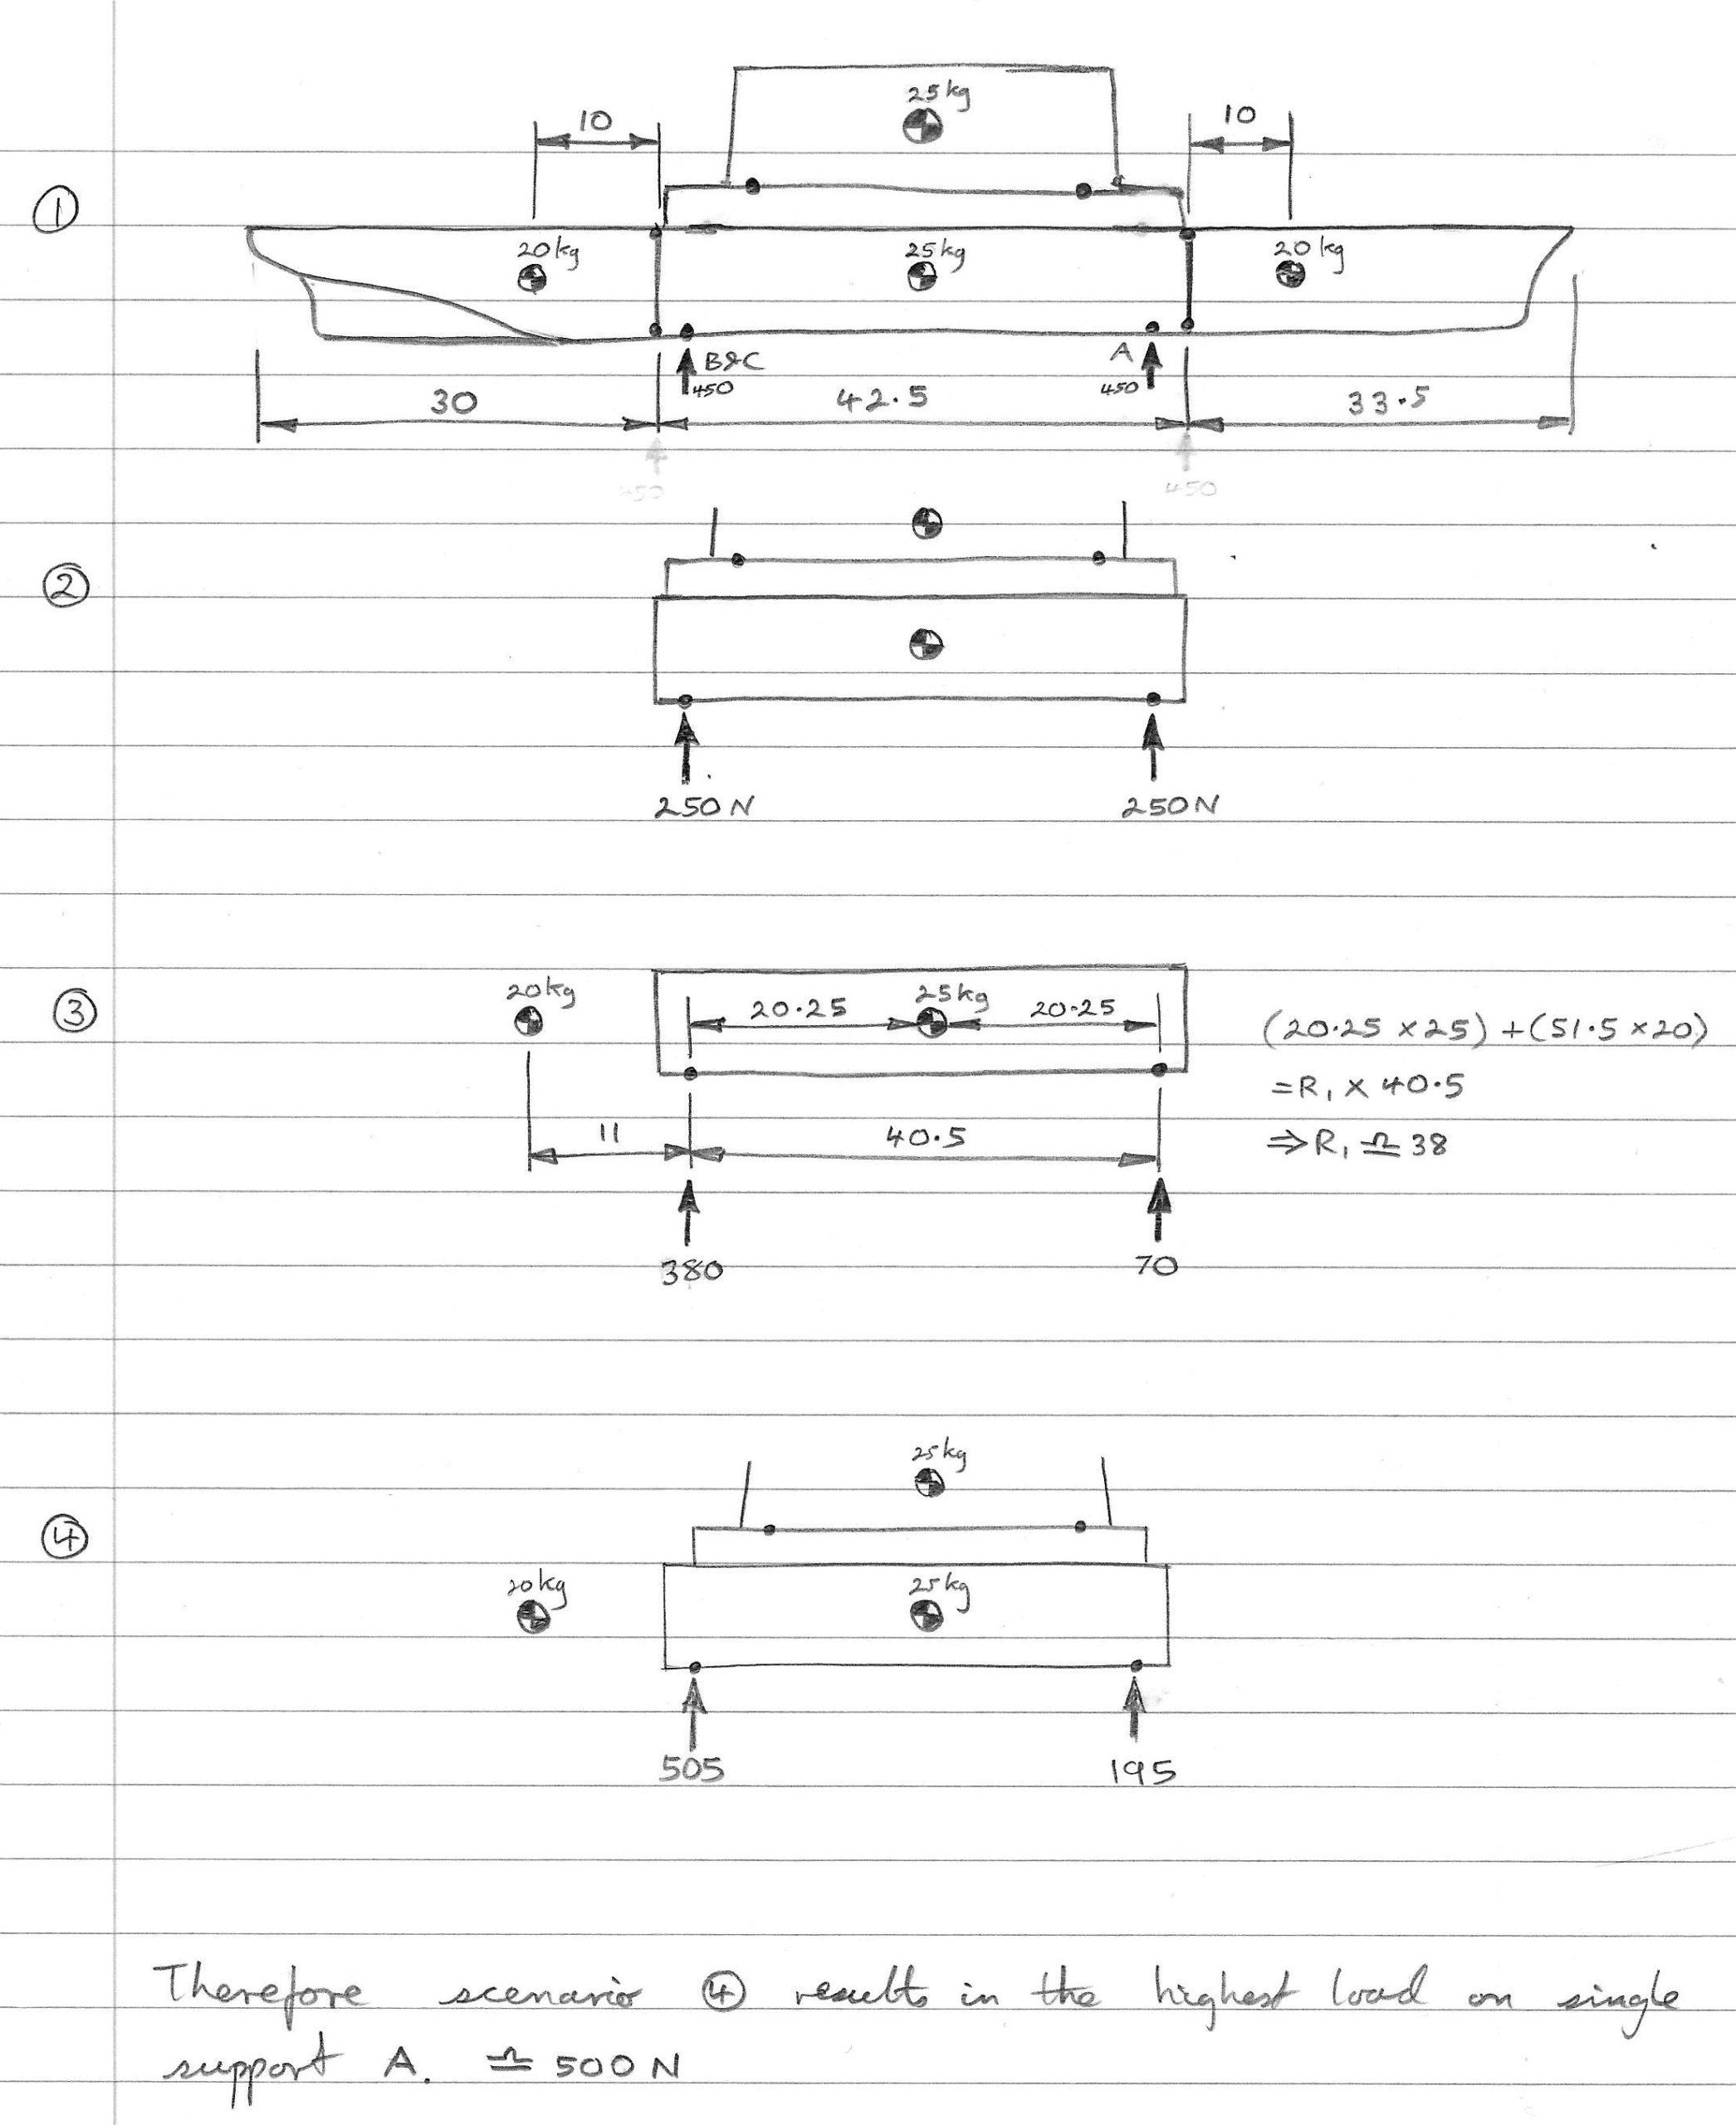 Assembly scenarios